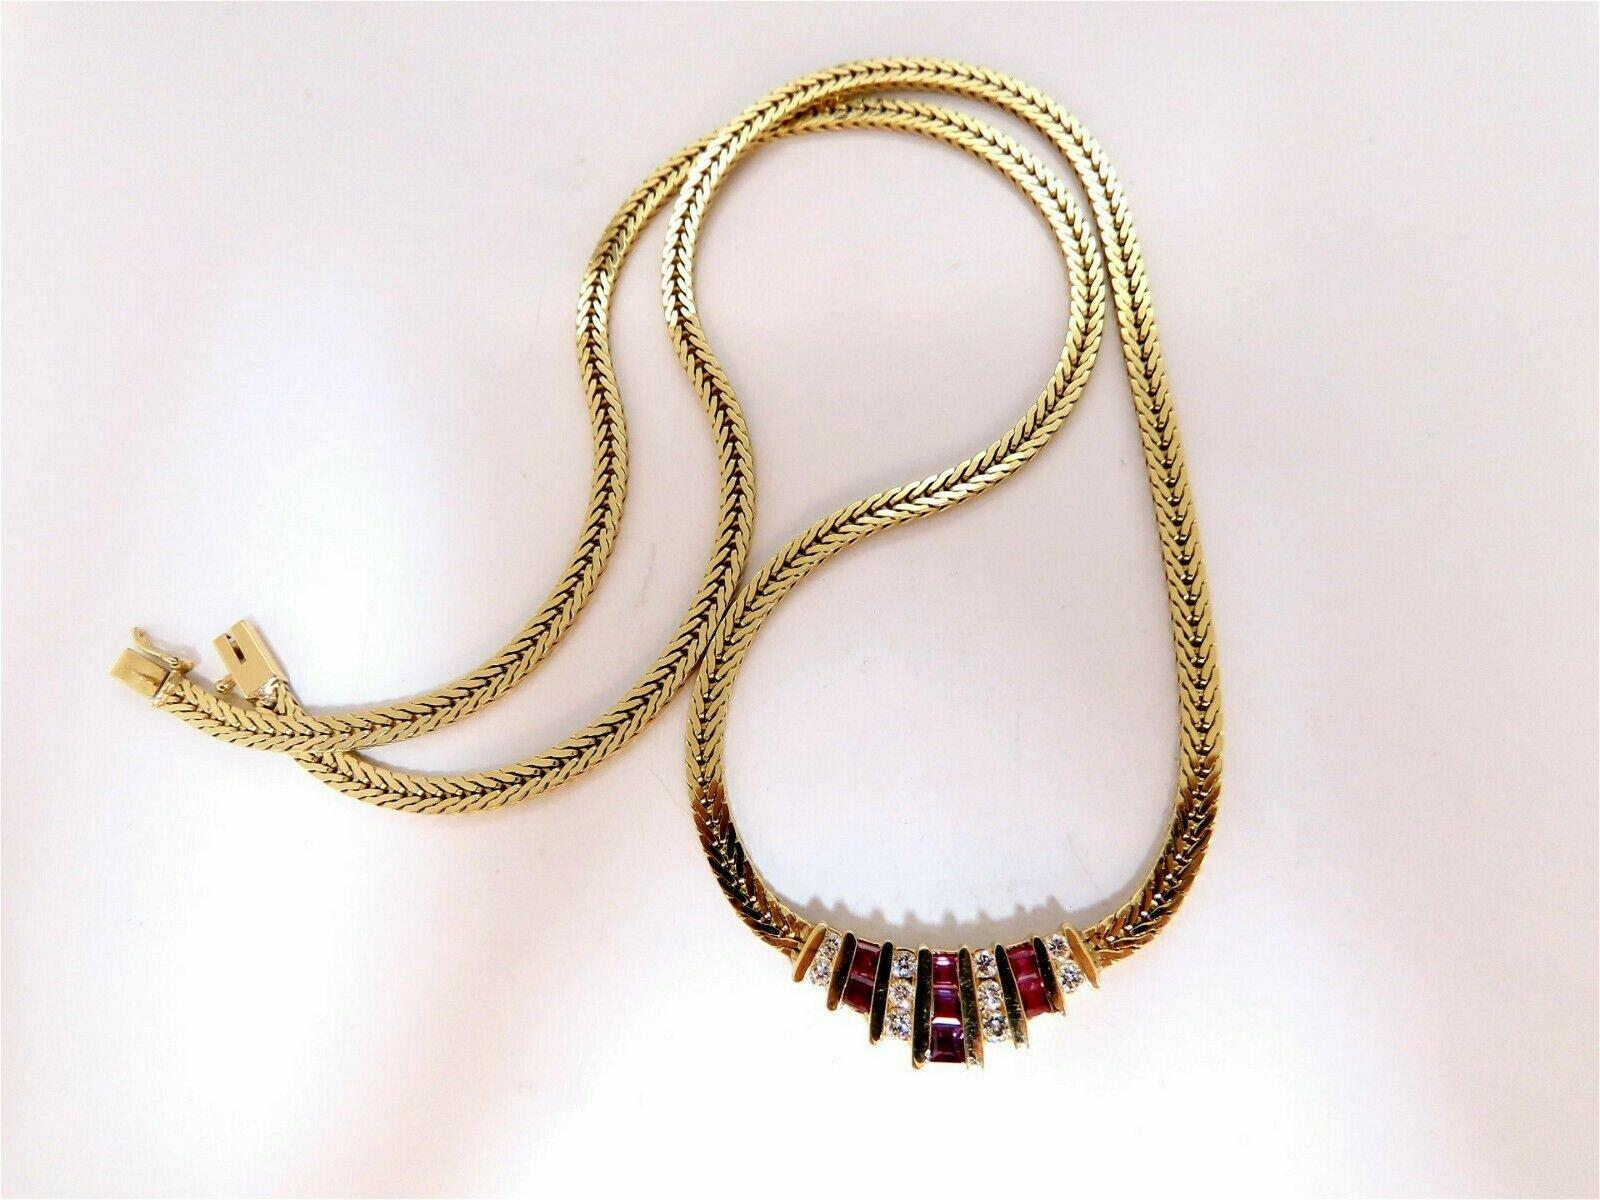 1.36ct Natural Ruby Diamonds Herringbone Necklace 14 kt